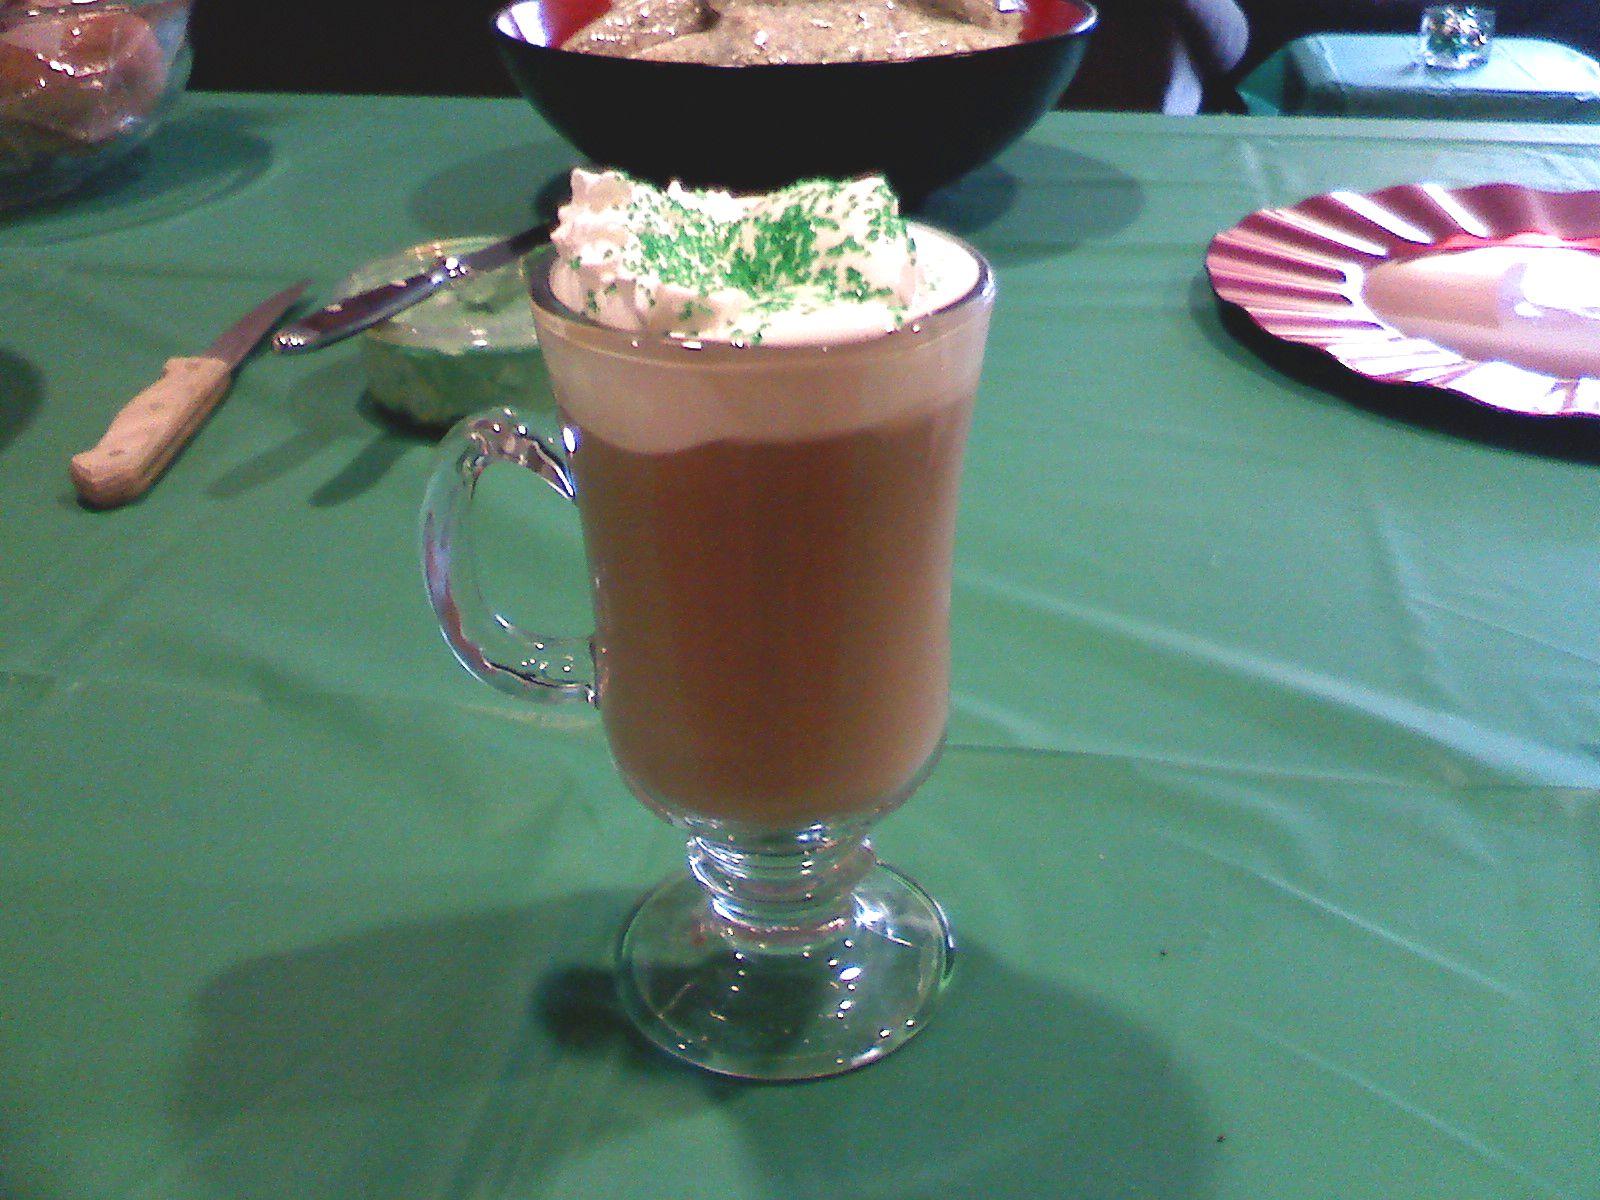 Yummy fresh brewed Irish coffee with homemade whipped cream. Sláinte!